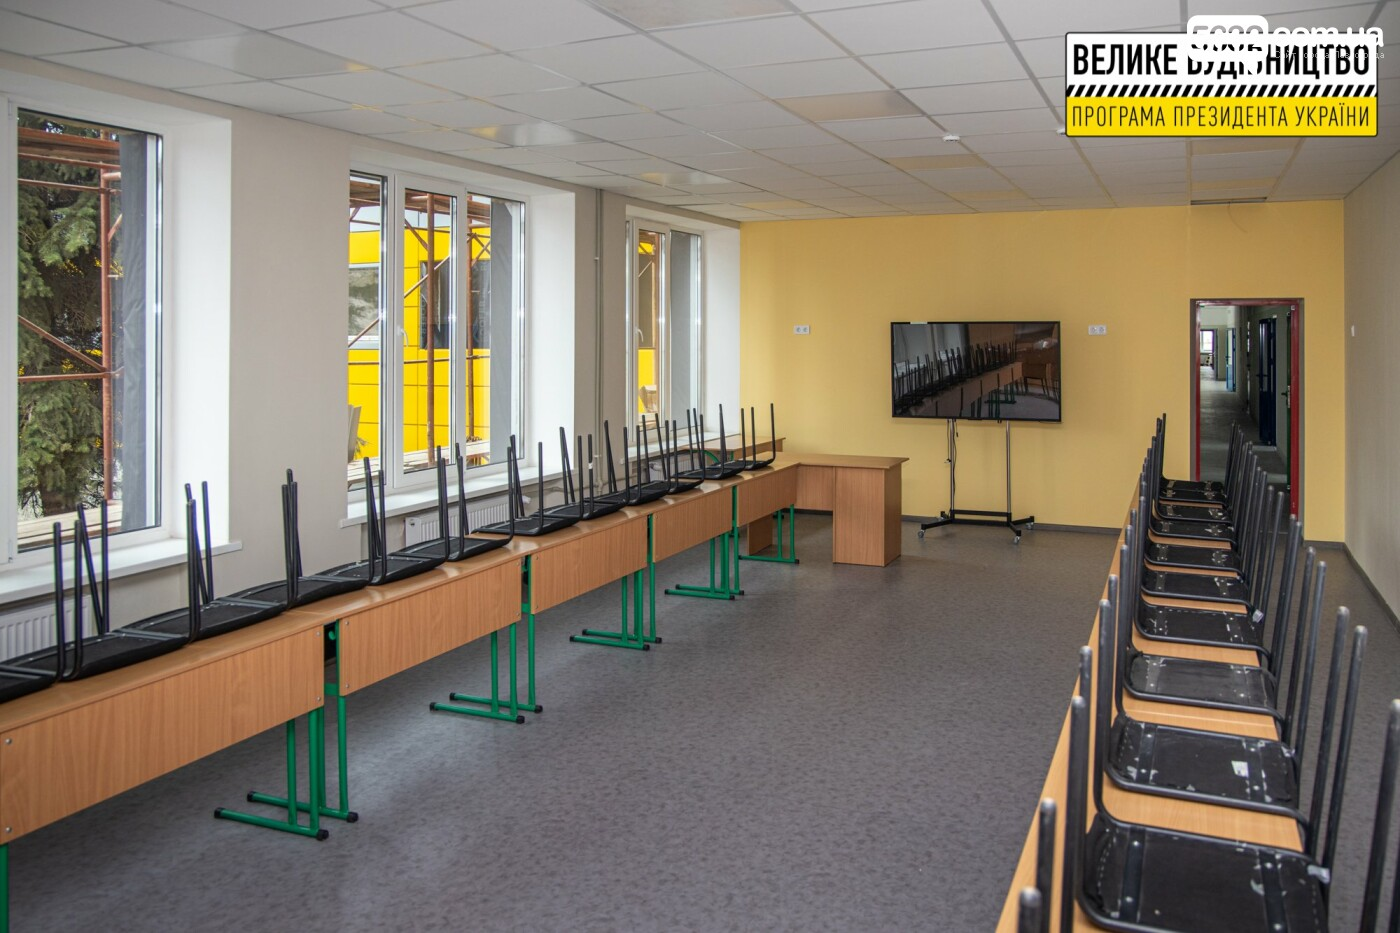 В Петропавловке модернизируют опорную школу (ФОТОРЕПОРТАЖ), фото-7